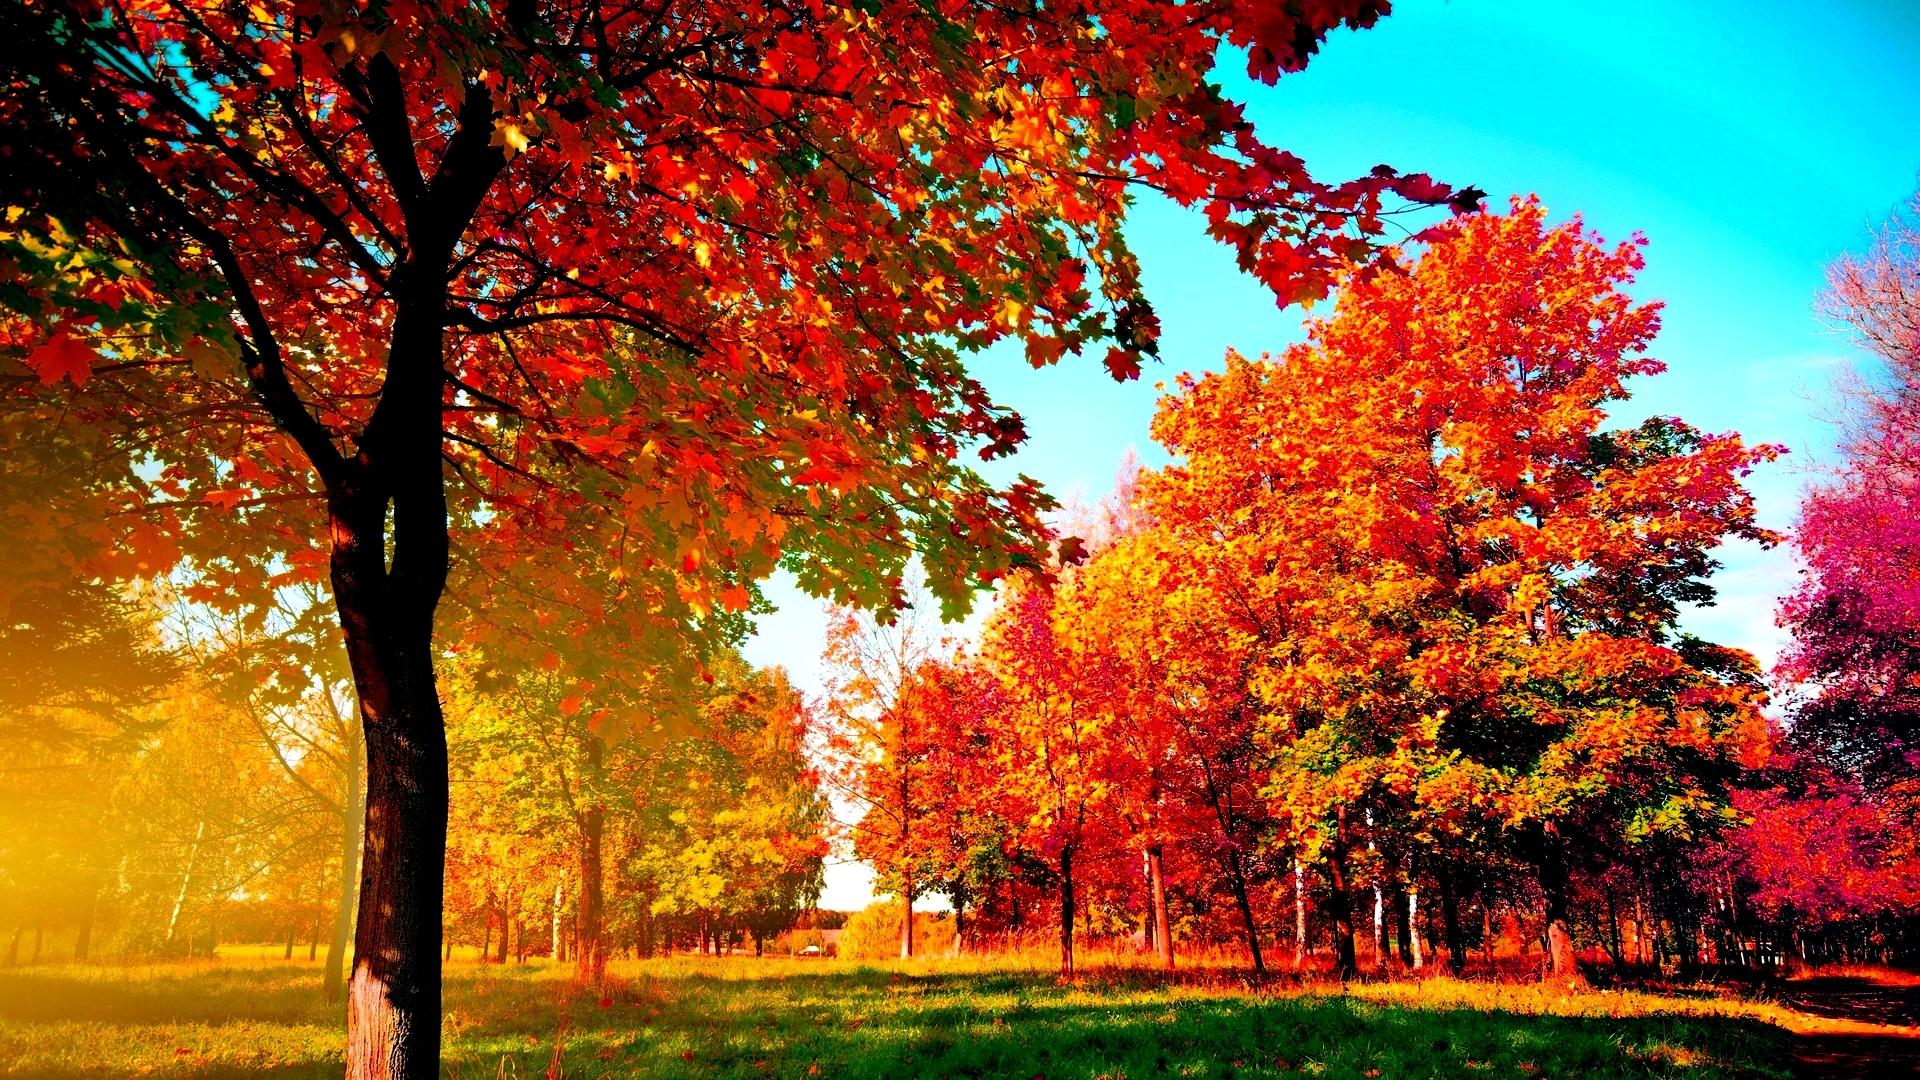 Autumn Trees Manuela Wallpaper 41643616 Fanpop